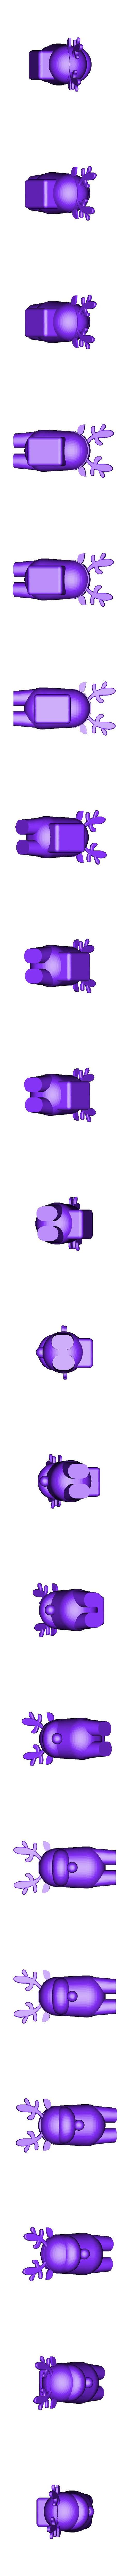 RENO.stl Download STL file AMONG US RENO • 3D print template, sebastiancabral719